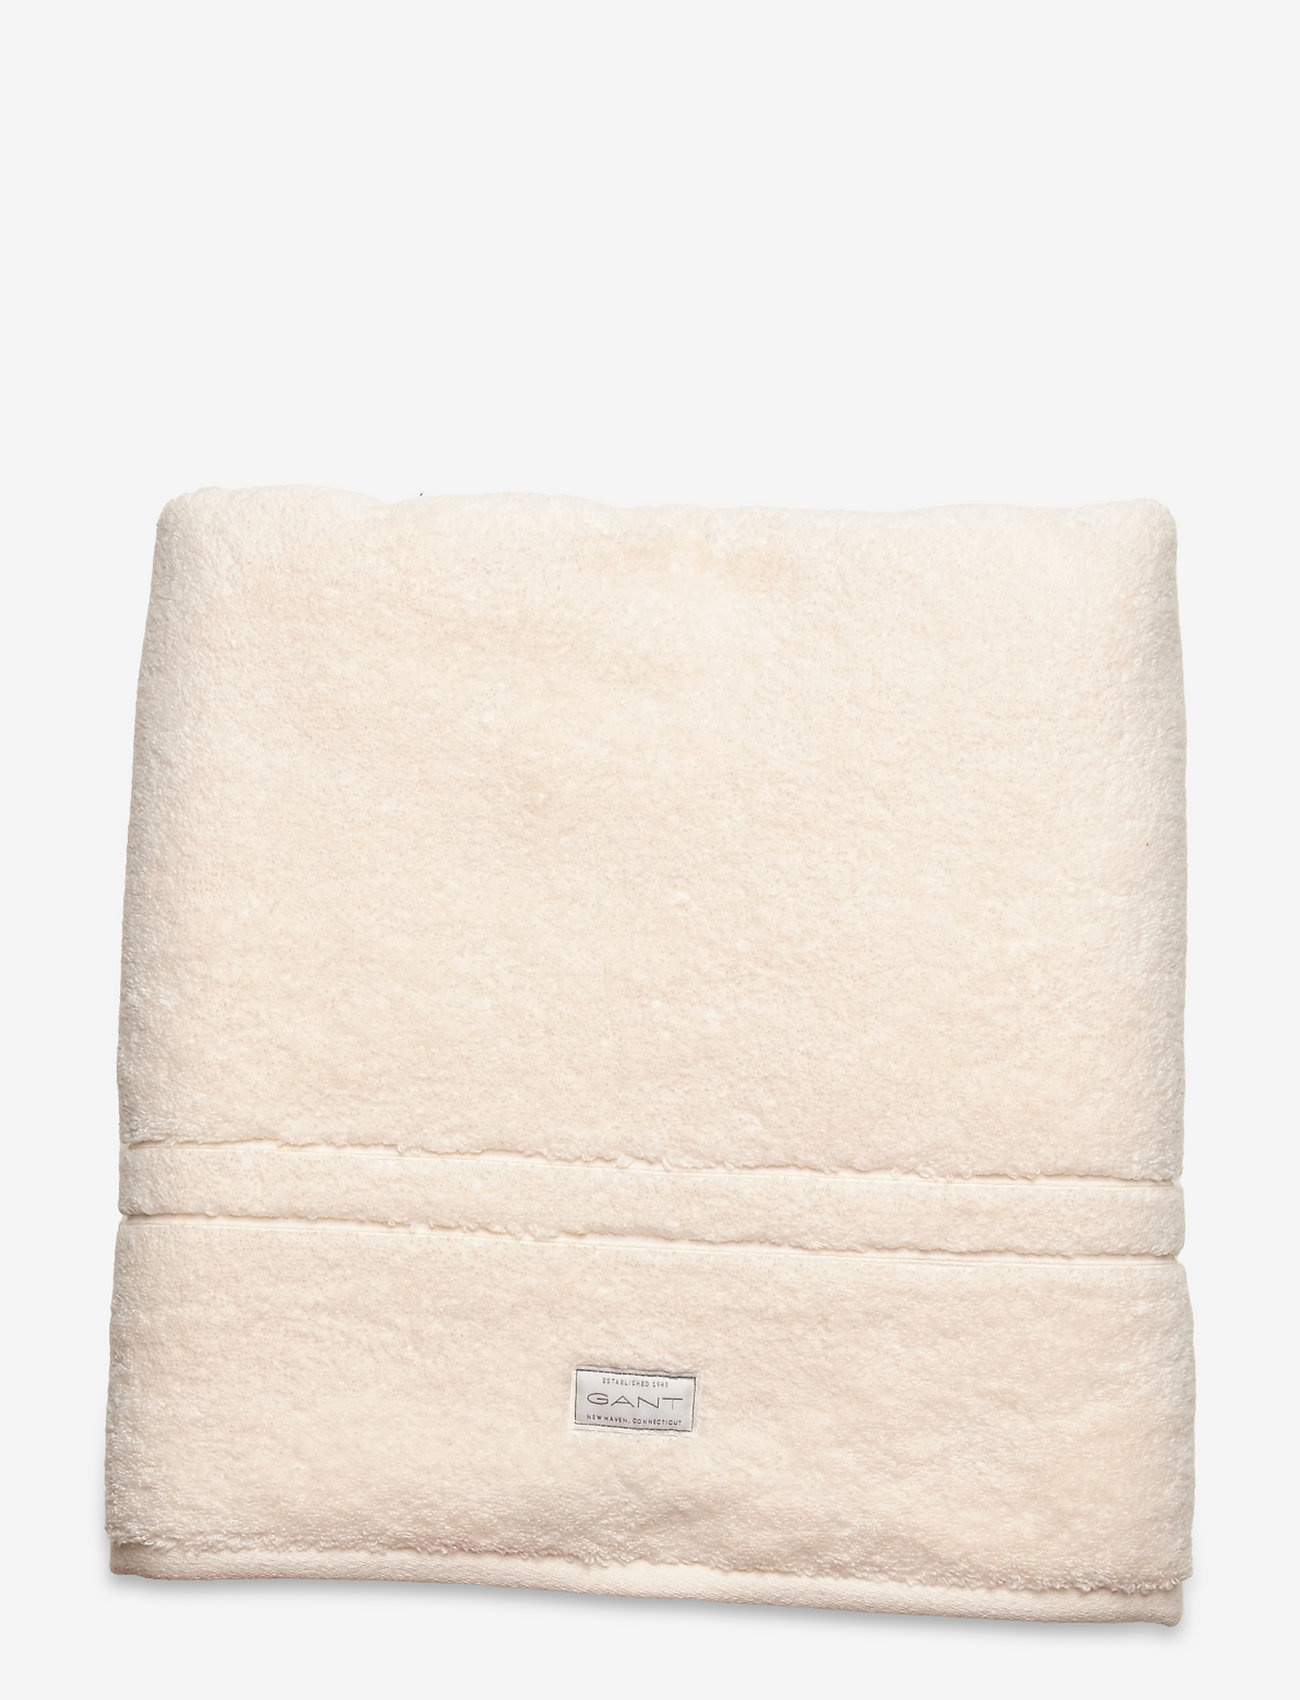 GANT - PREMIUM TOWEL 50X70 - hand towels & bath towels - white - 0